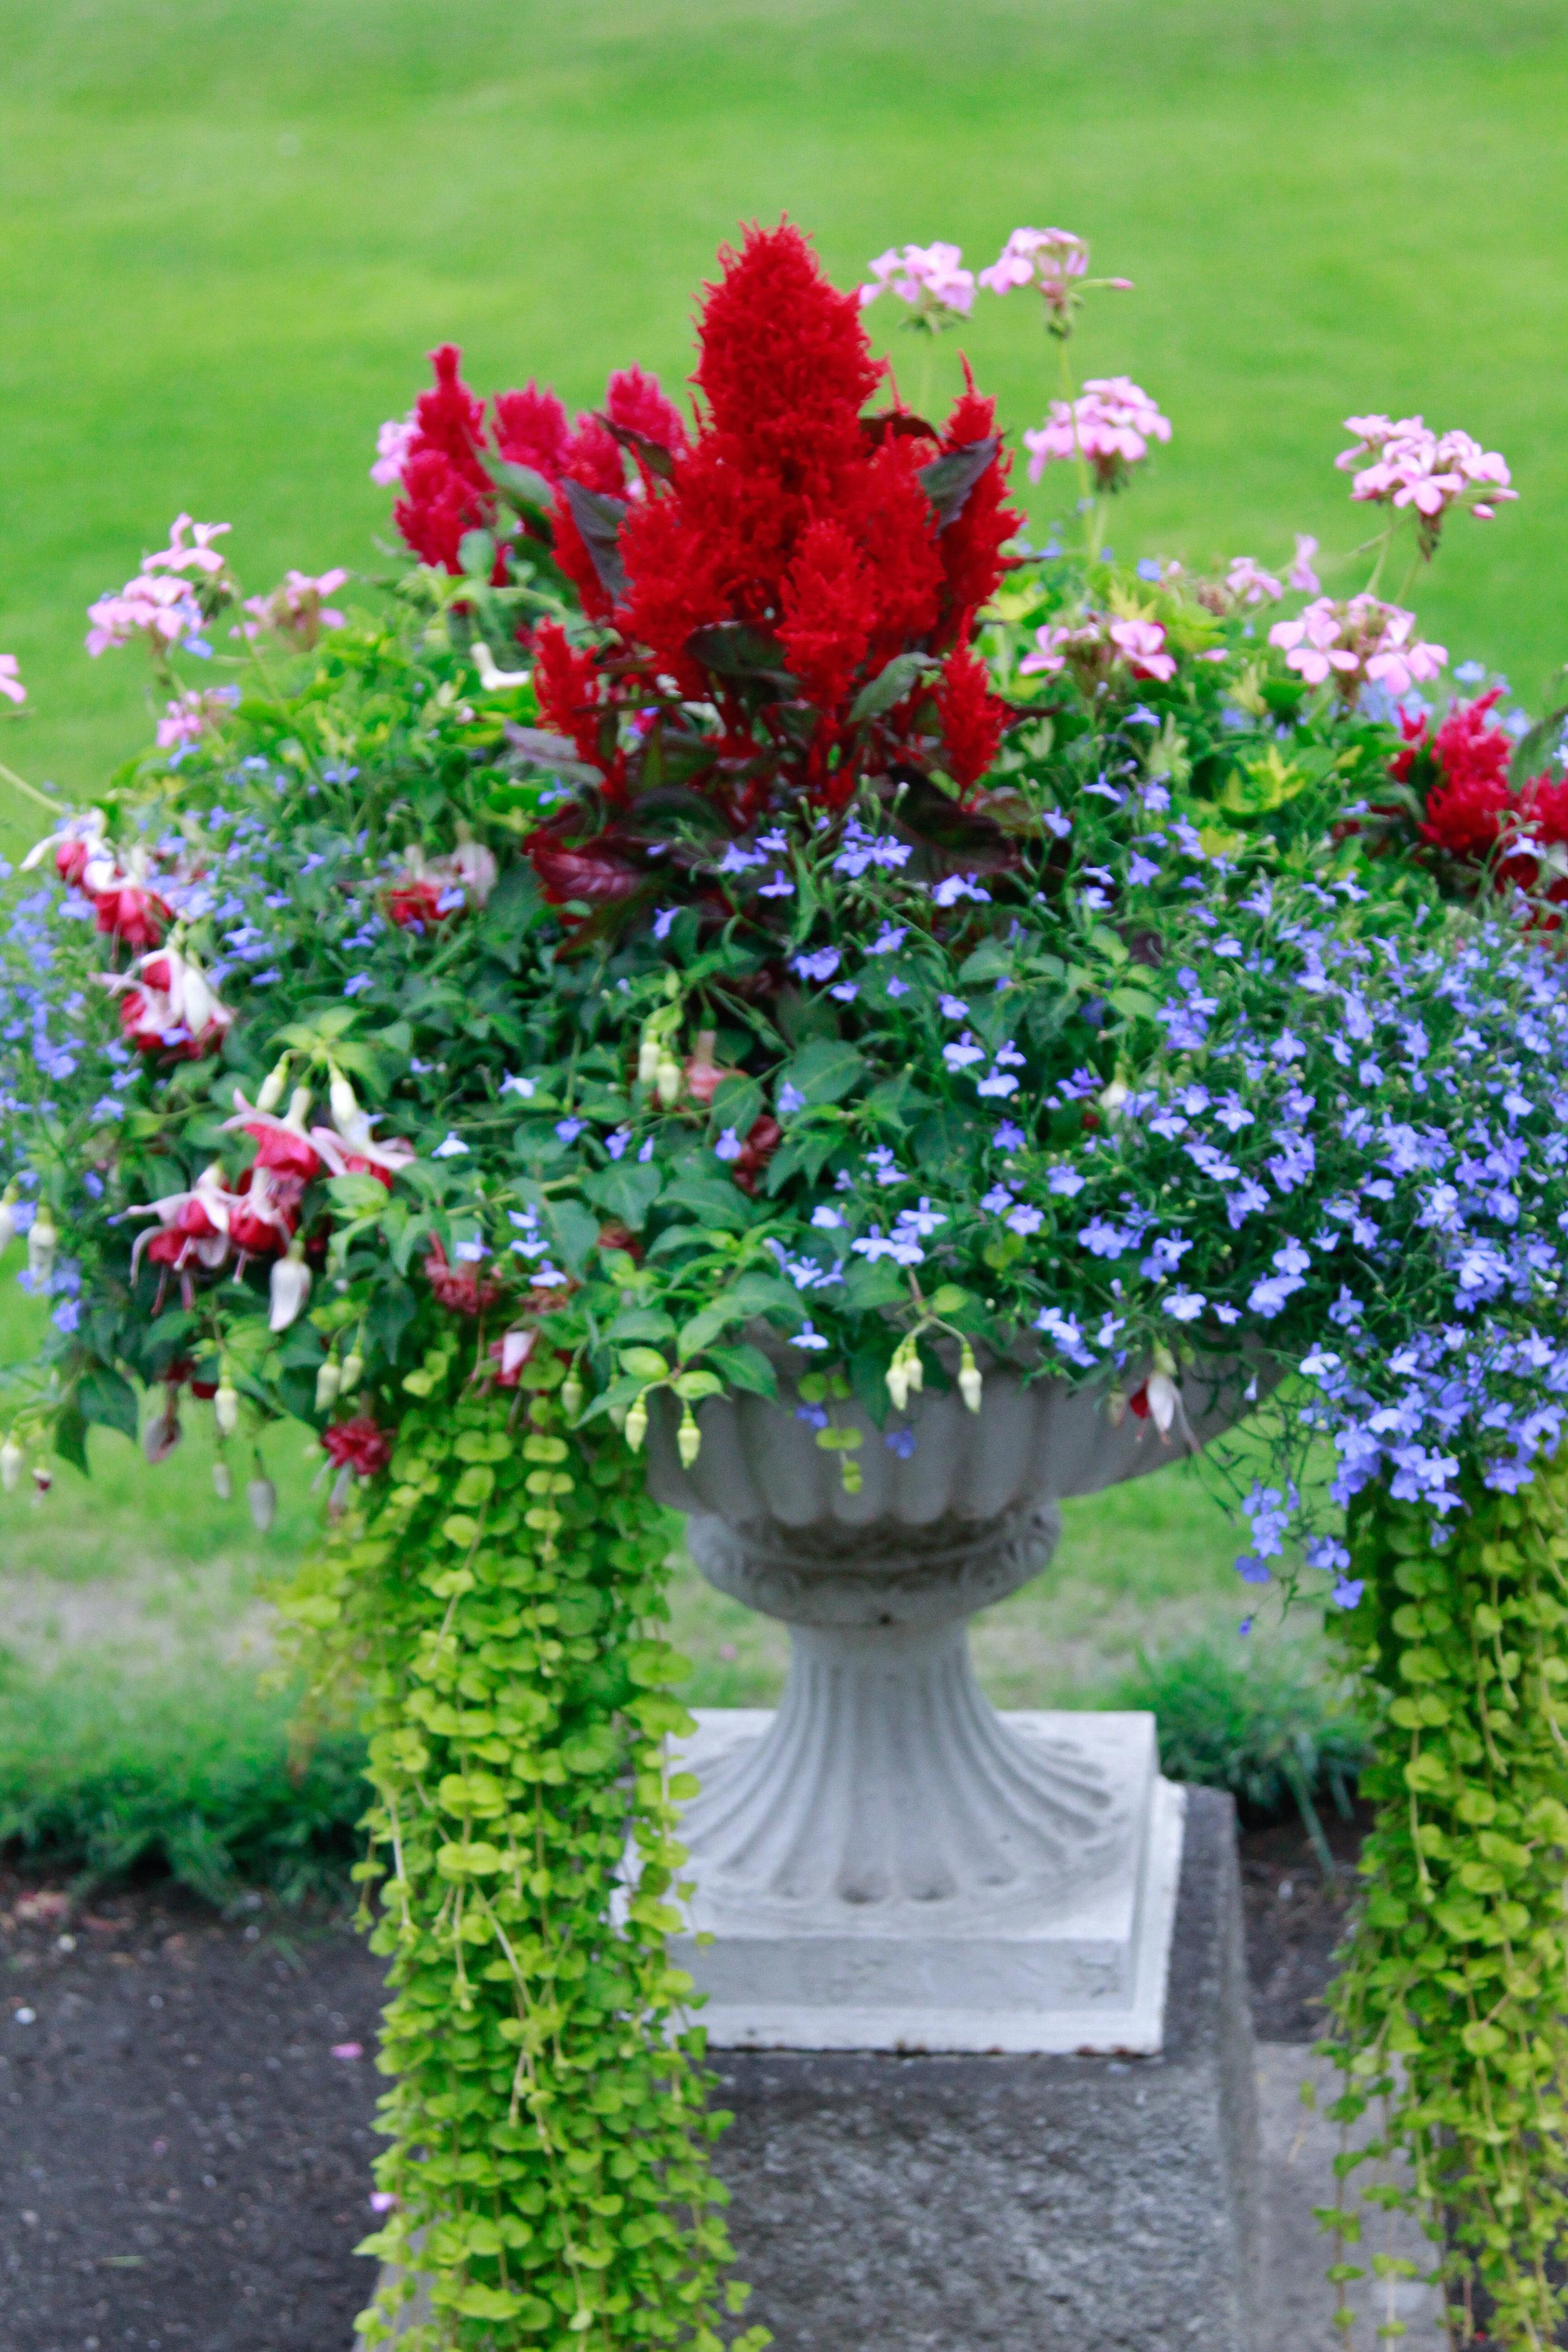 Floral arrangement in St Stephen's Green, Dublin